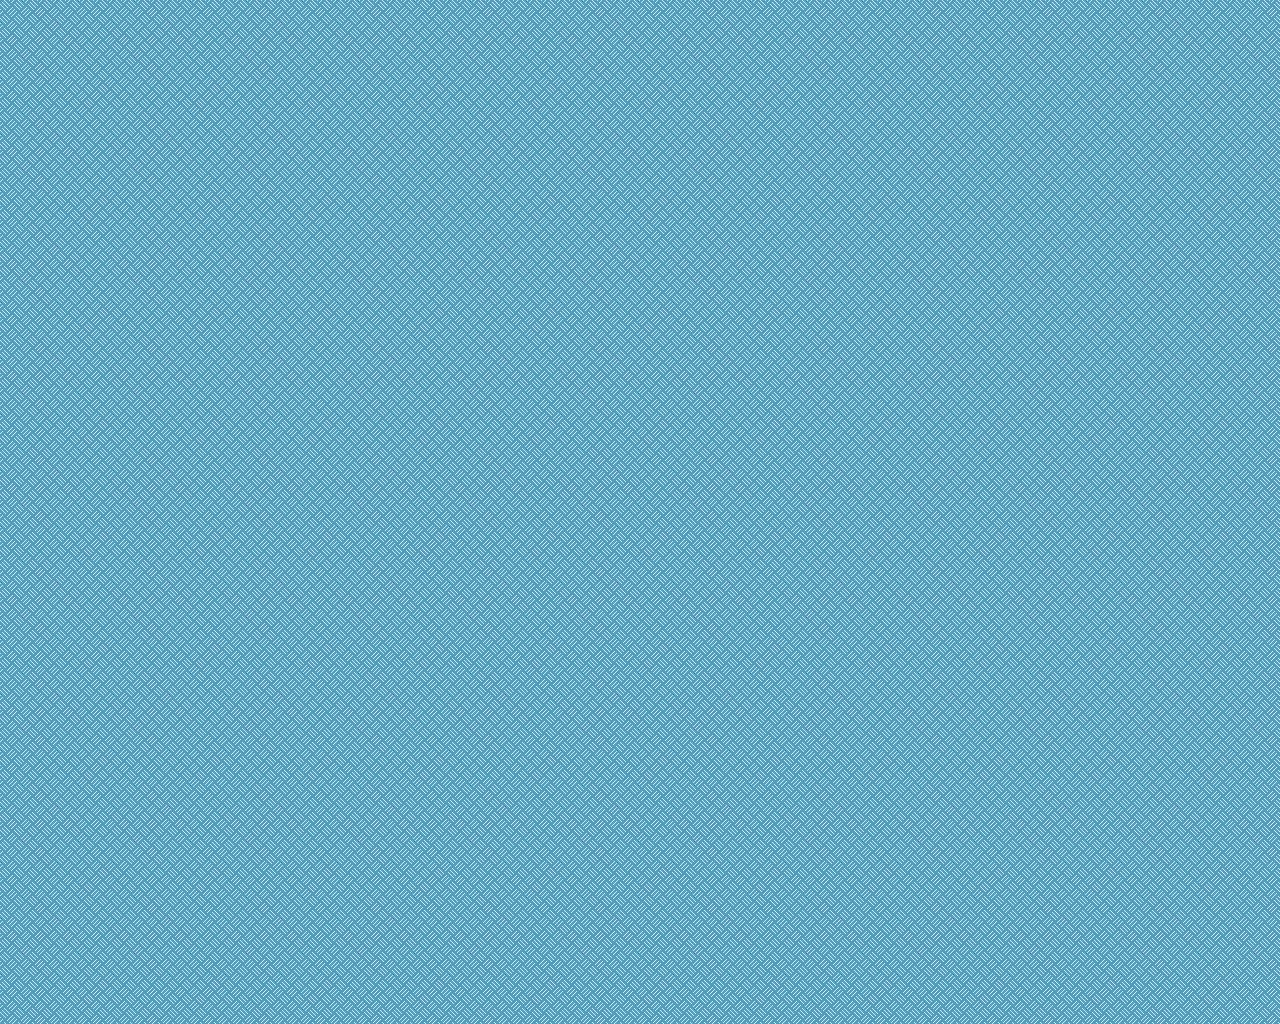 MrTarheel UNC Tarheel Wallpapers 1280x1024